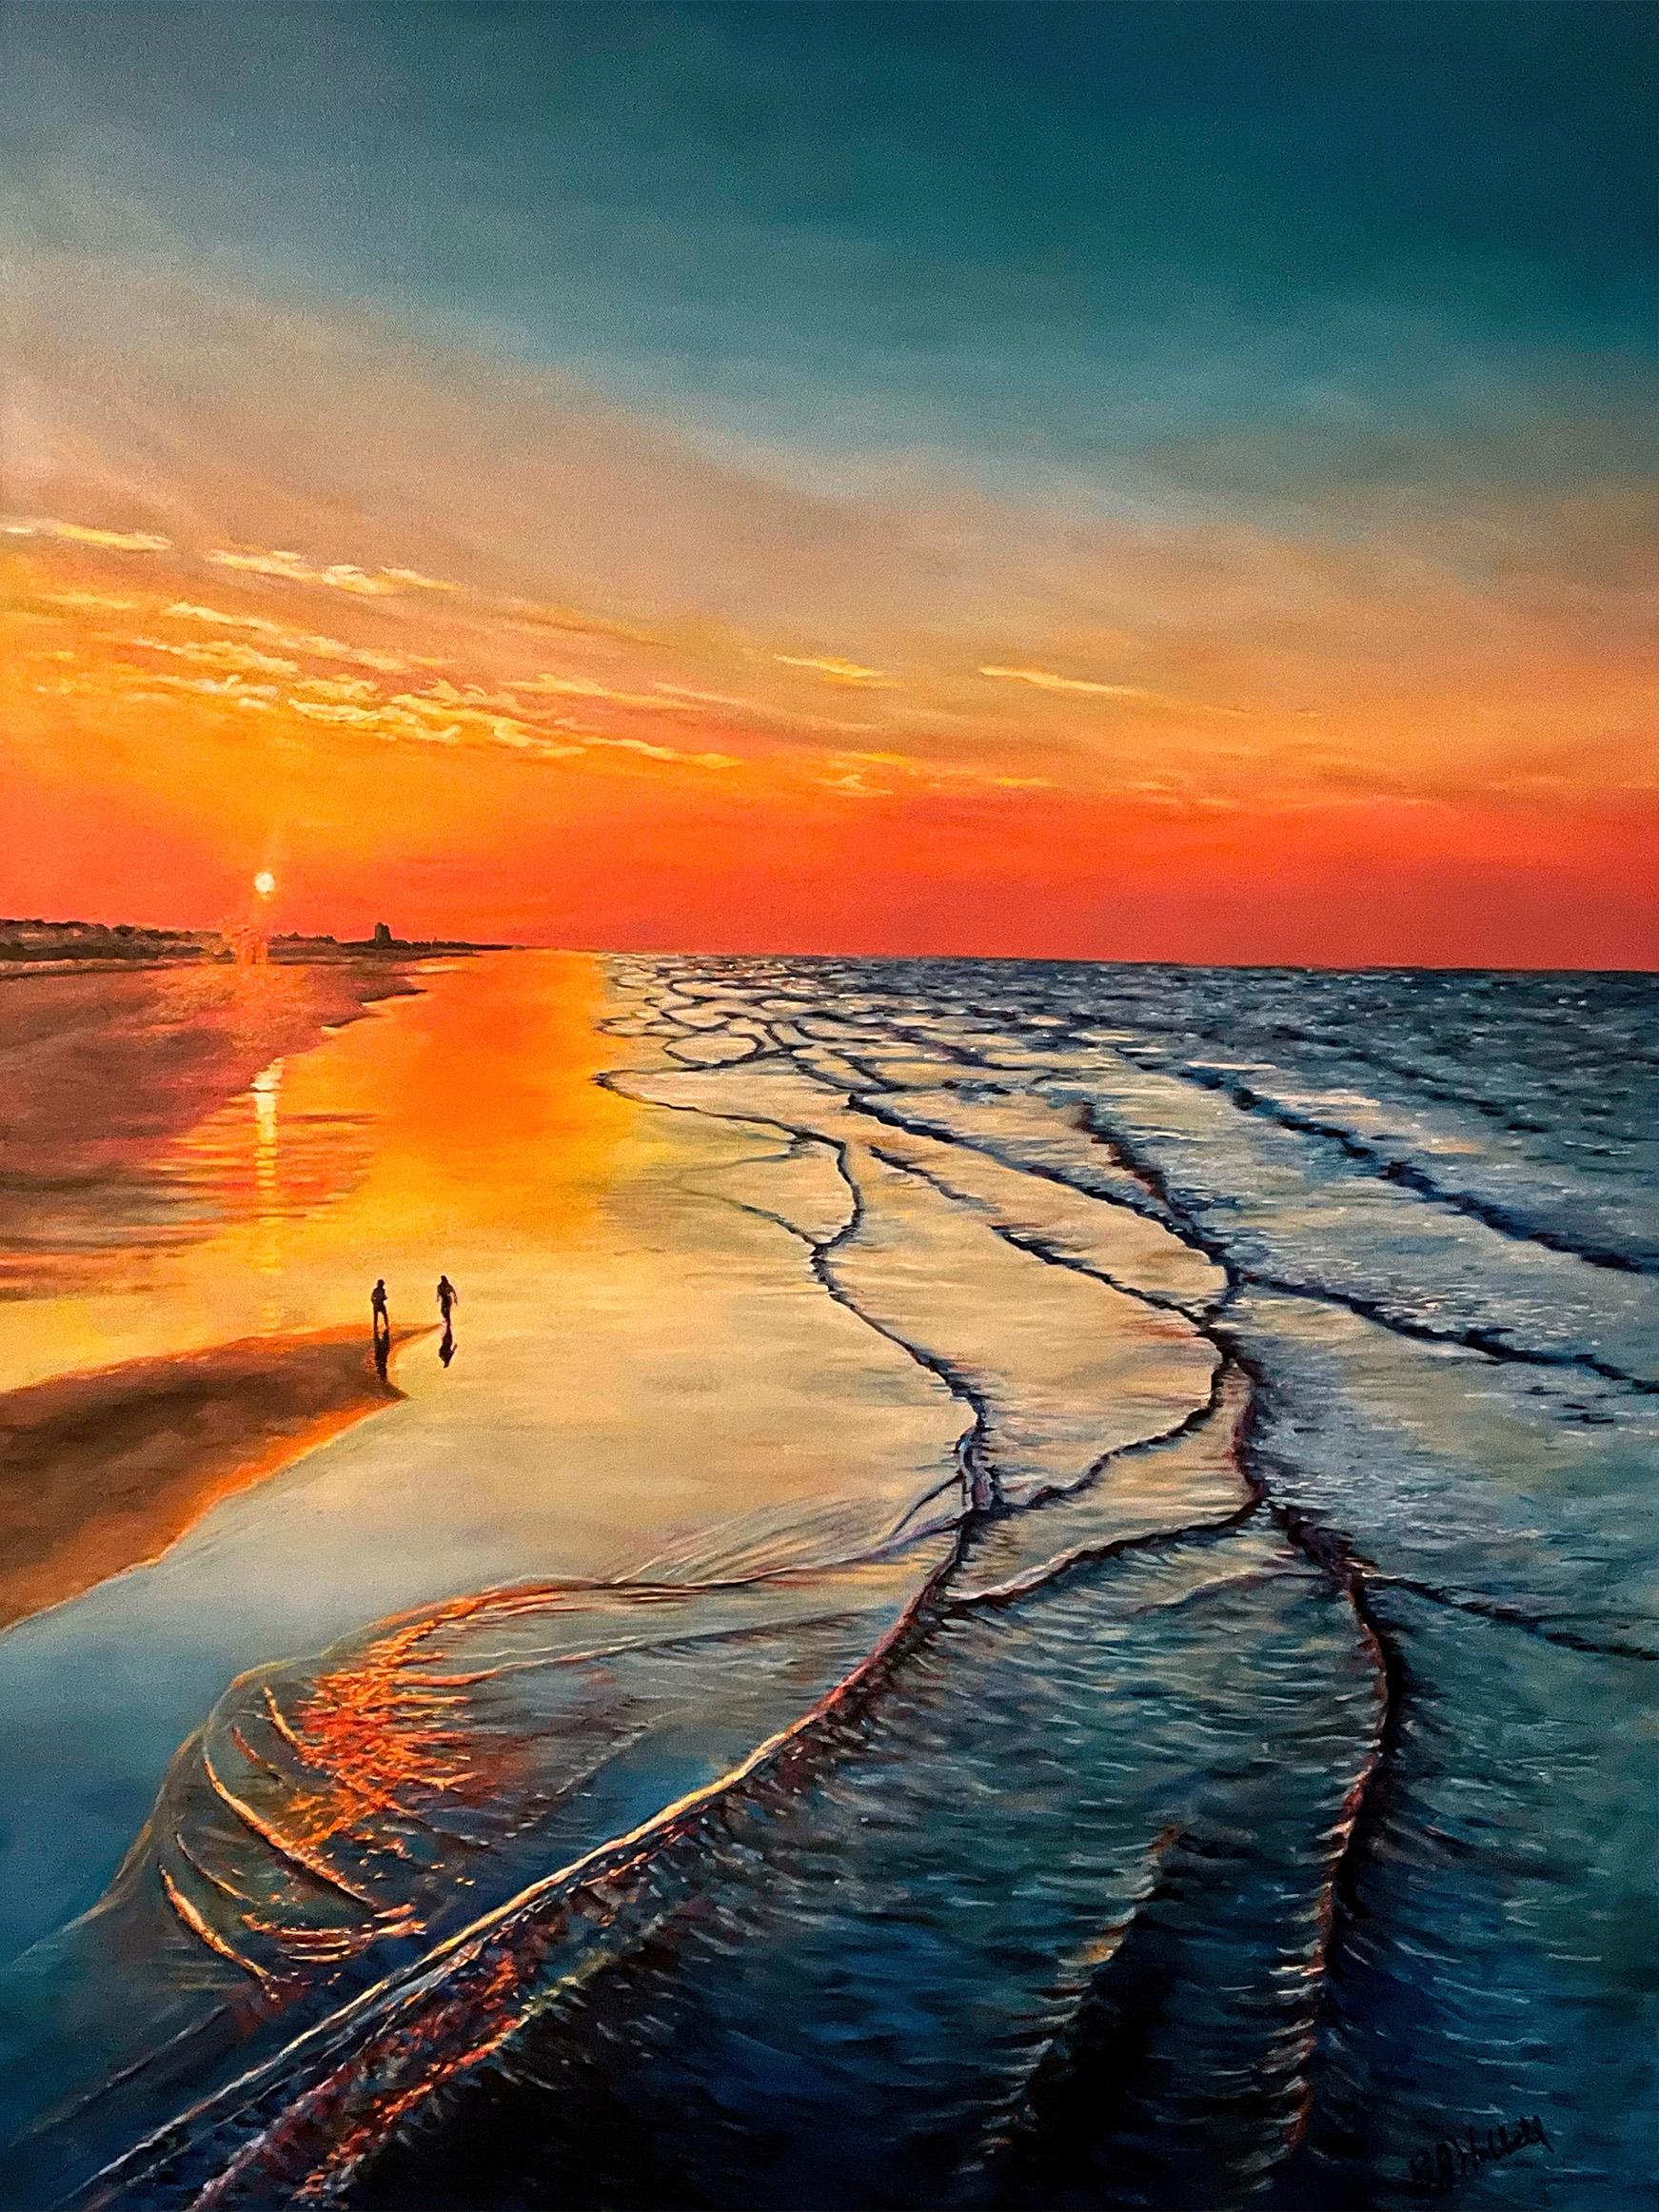 bjh-evening-walk-in-paradise